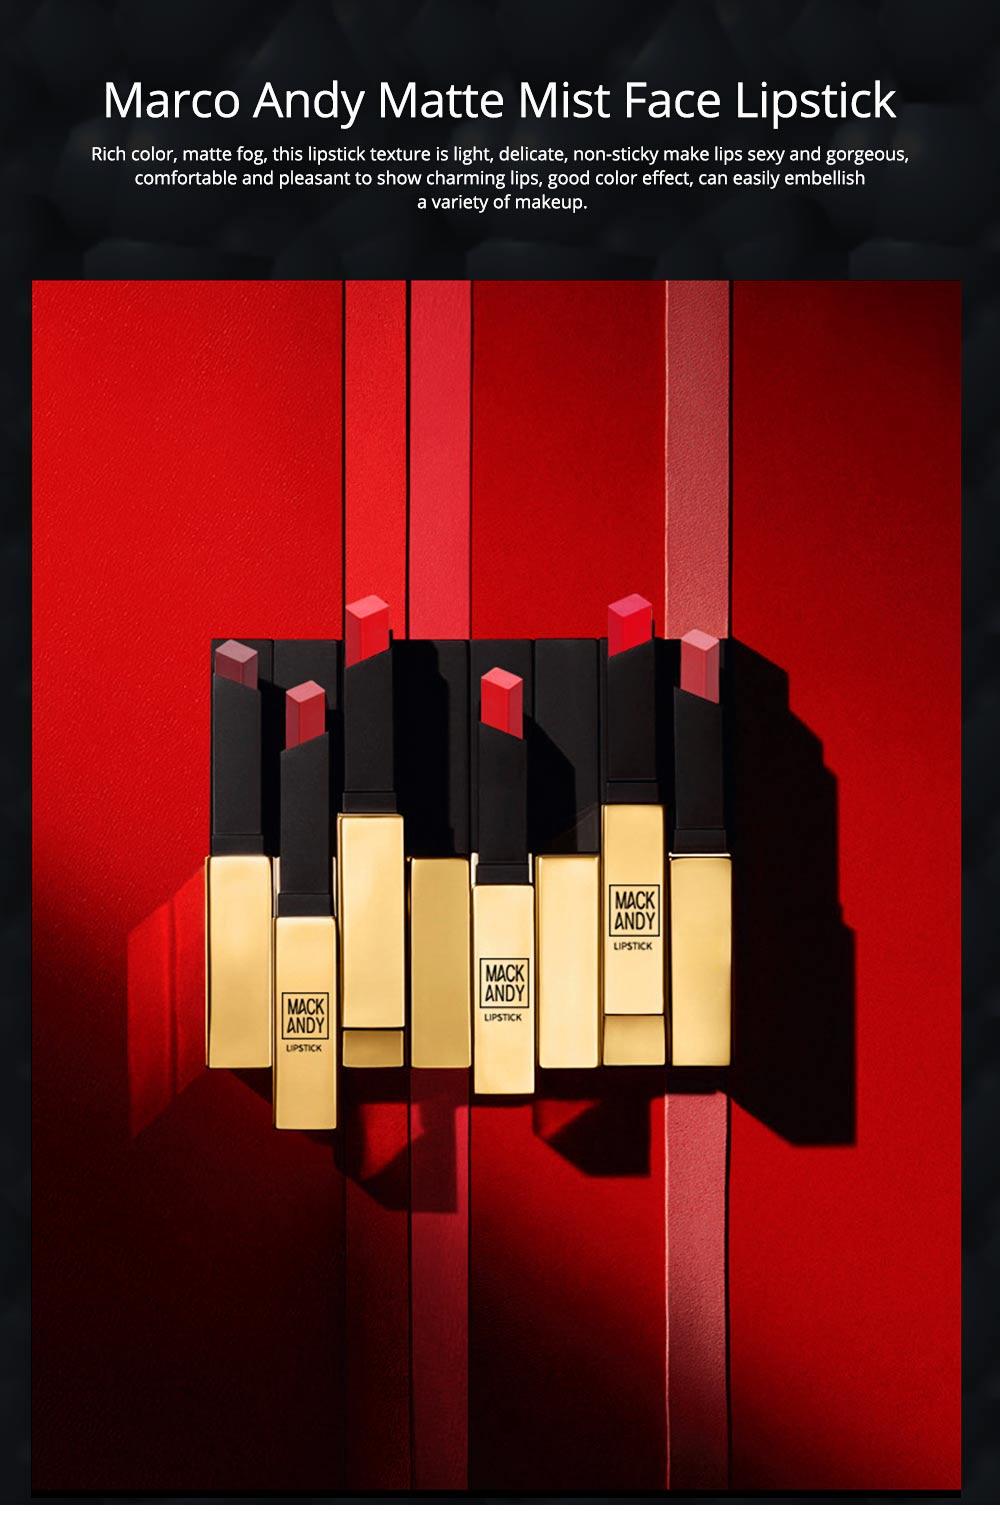 Matte Mist Face Lipstick with Little Gold Tube, Durable Light Stickiness Small Gold Bar Matte Lipstick for Girls 0